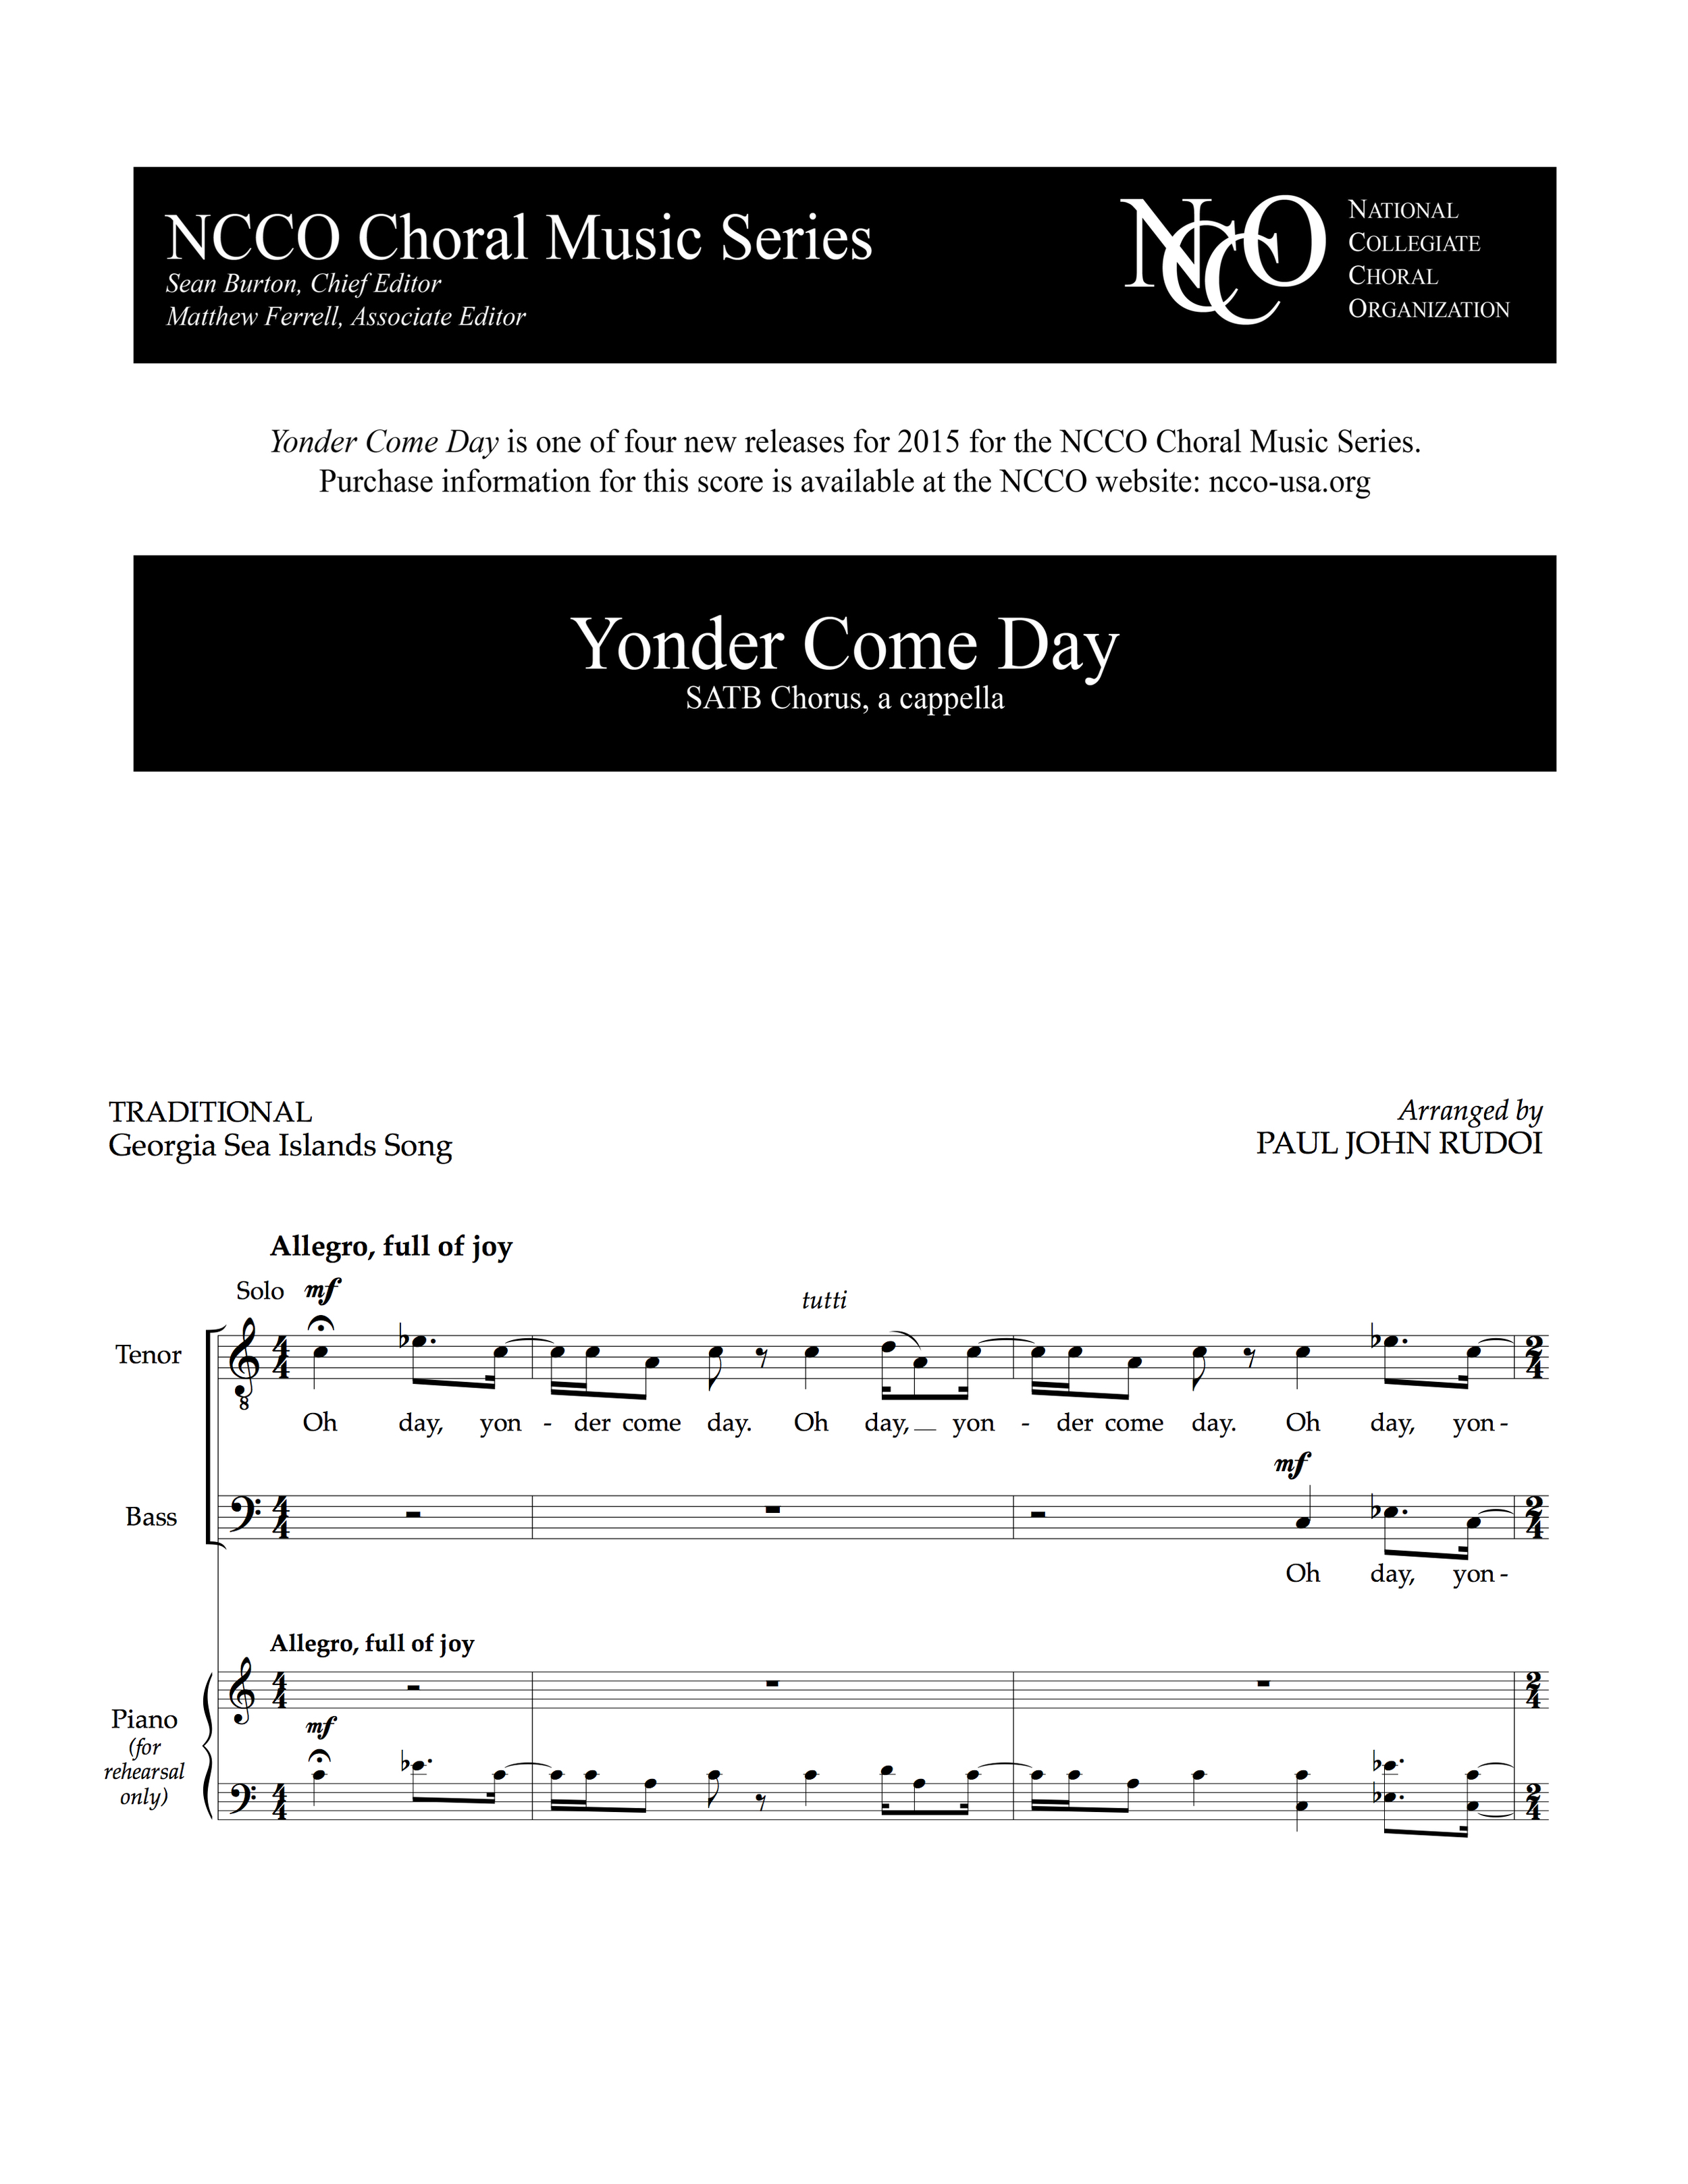 Yonder Come Day_SATB_Rudoi.jpg